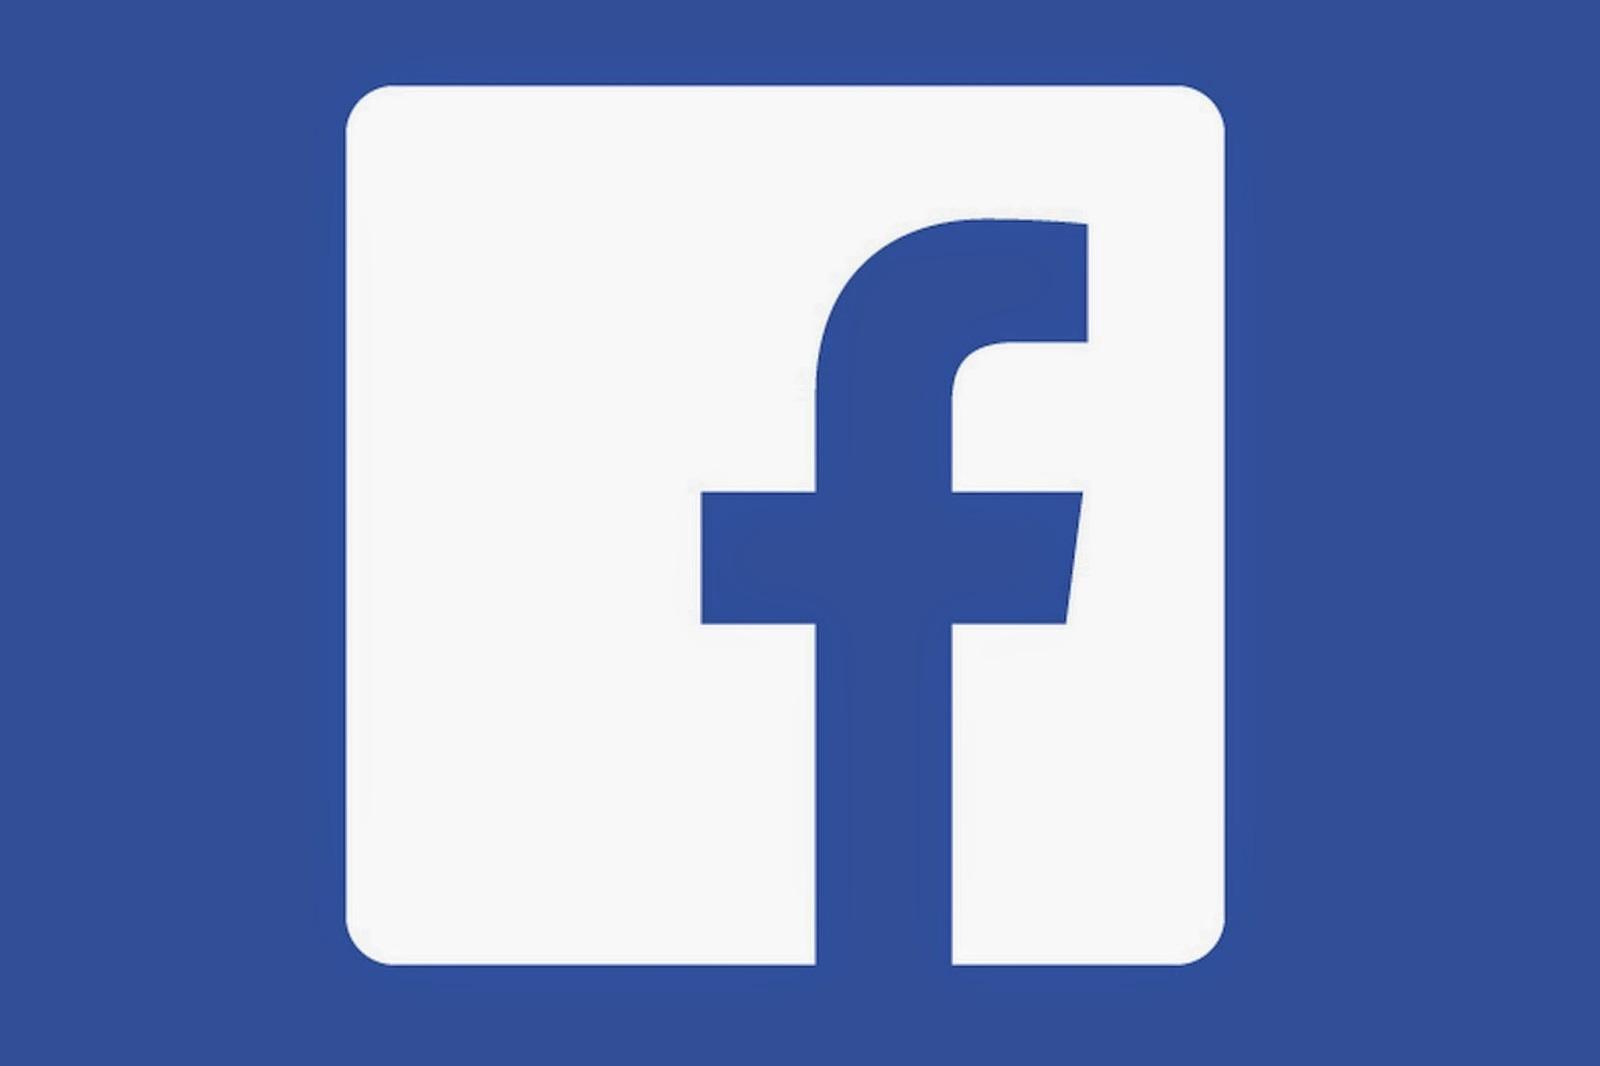 Facebook logo hd clipart jpg royalty free Facebook Logo Clipart | Free download best Facebook Logo Clipart on ... jpg royalty free